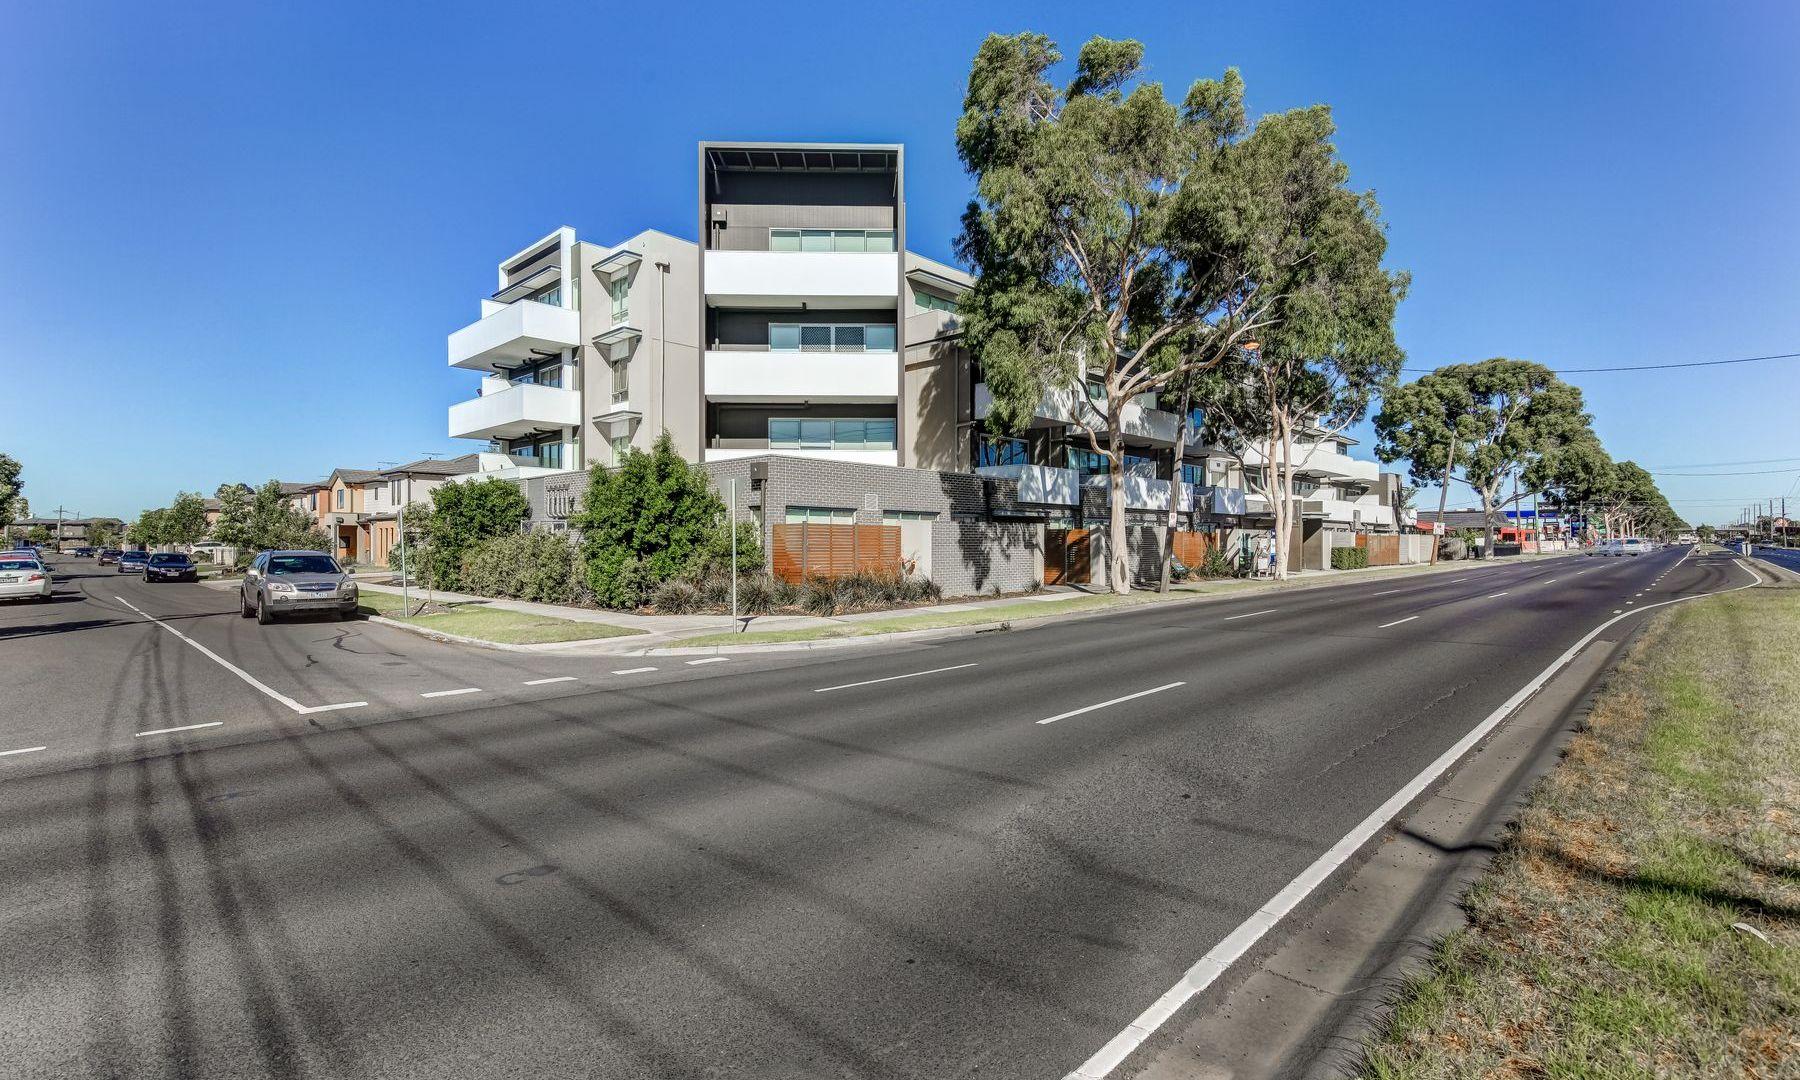 3/251 Ballarat Road, Braybrook VIC 3019, Image 1